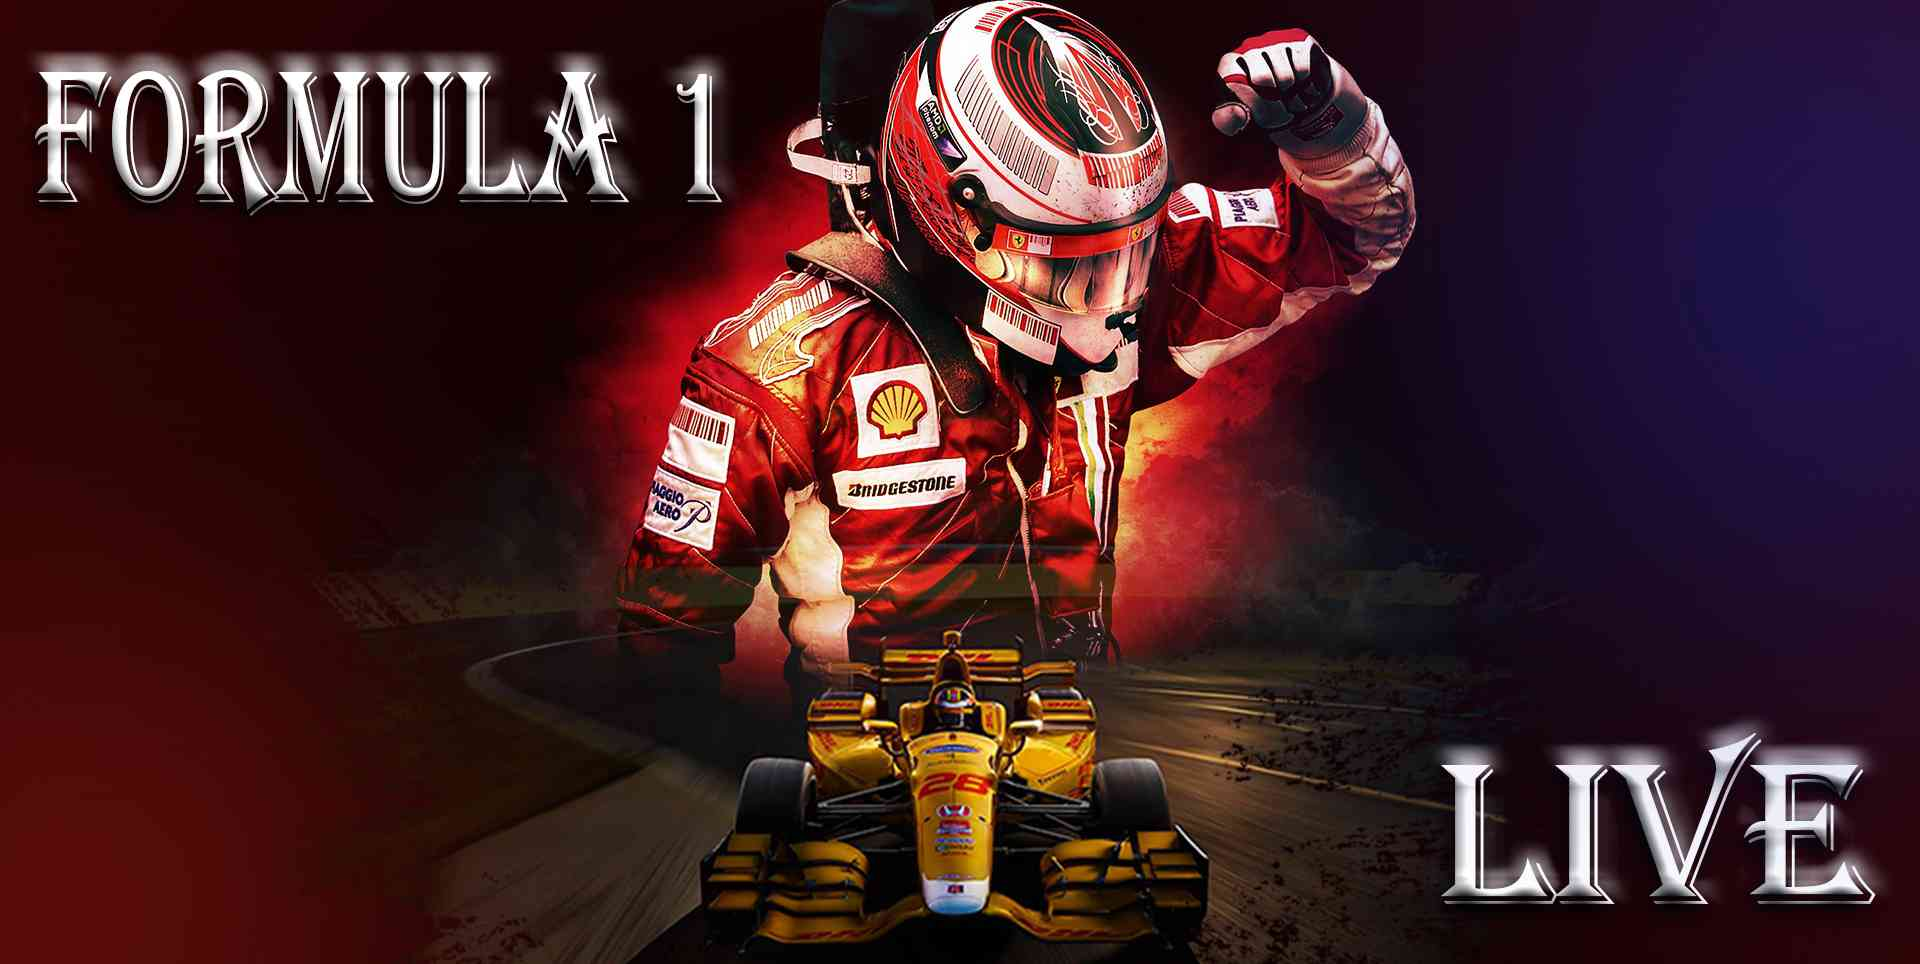 2016-formula-one-grandprix-live